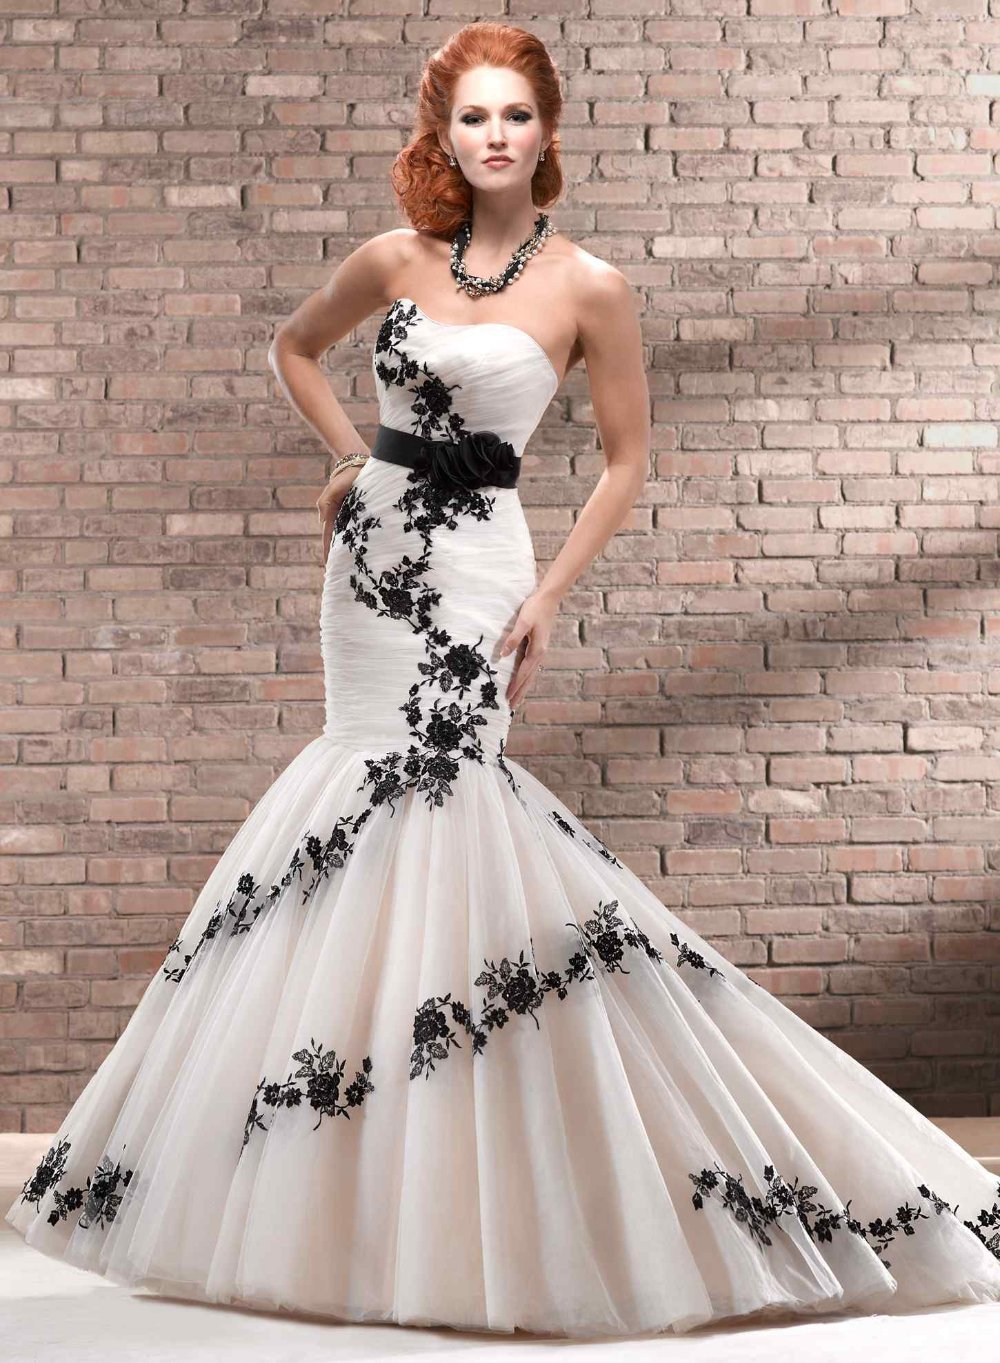 bride dress Sexy Ruffle vestido de noiva robe de mariee Sweetheart Black Lace Cover Mermaid Wedding Dresses 2019 bridal gown in Wedding Dresses from Weddings Events